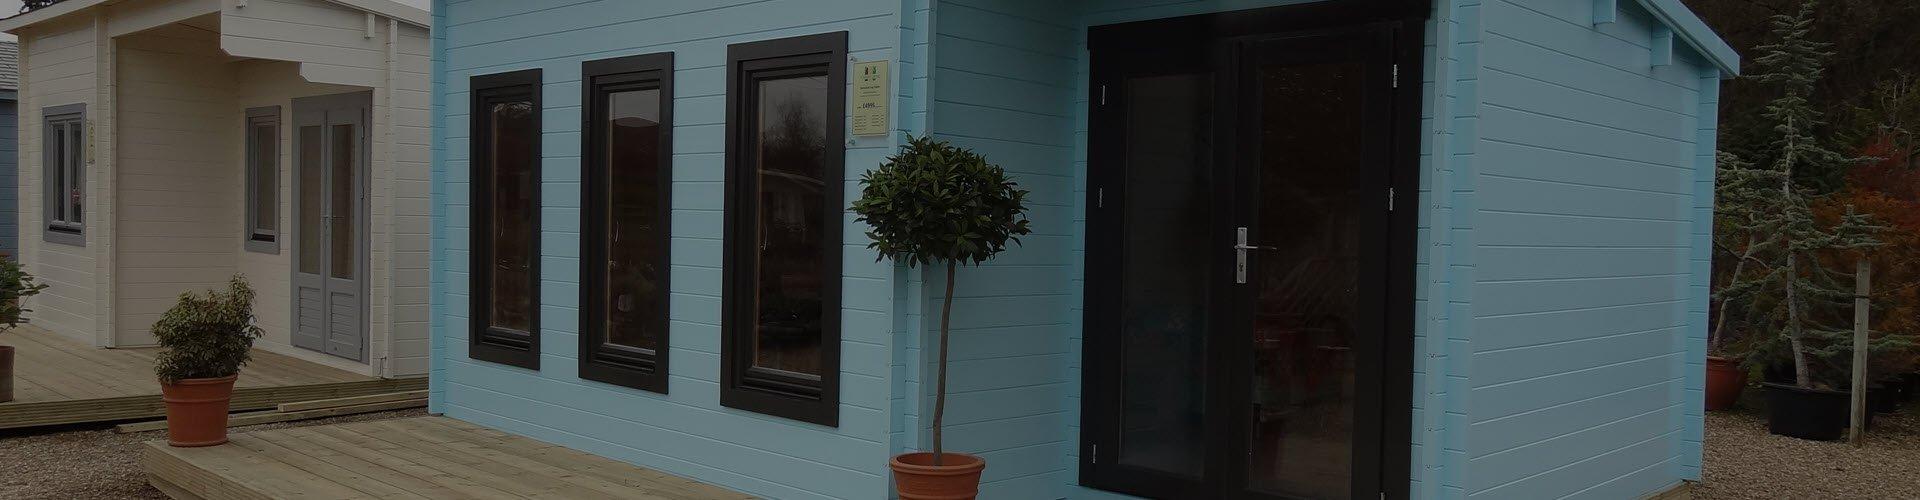 Log Cabins, Garden Buildings, Home Offices - Farnham